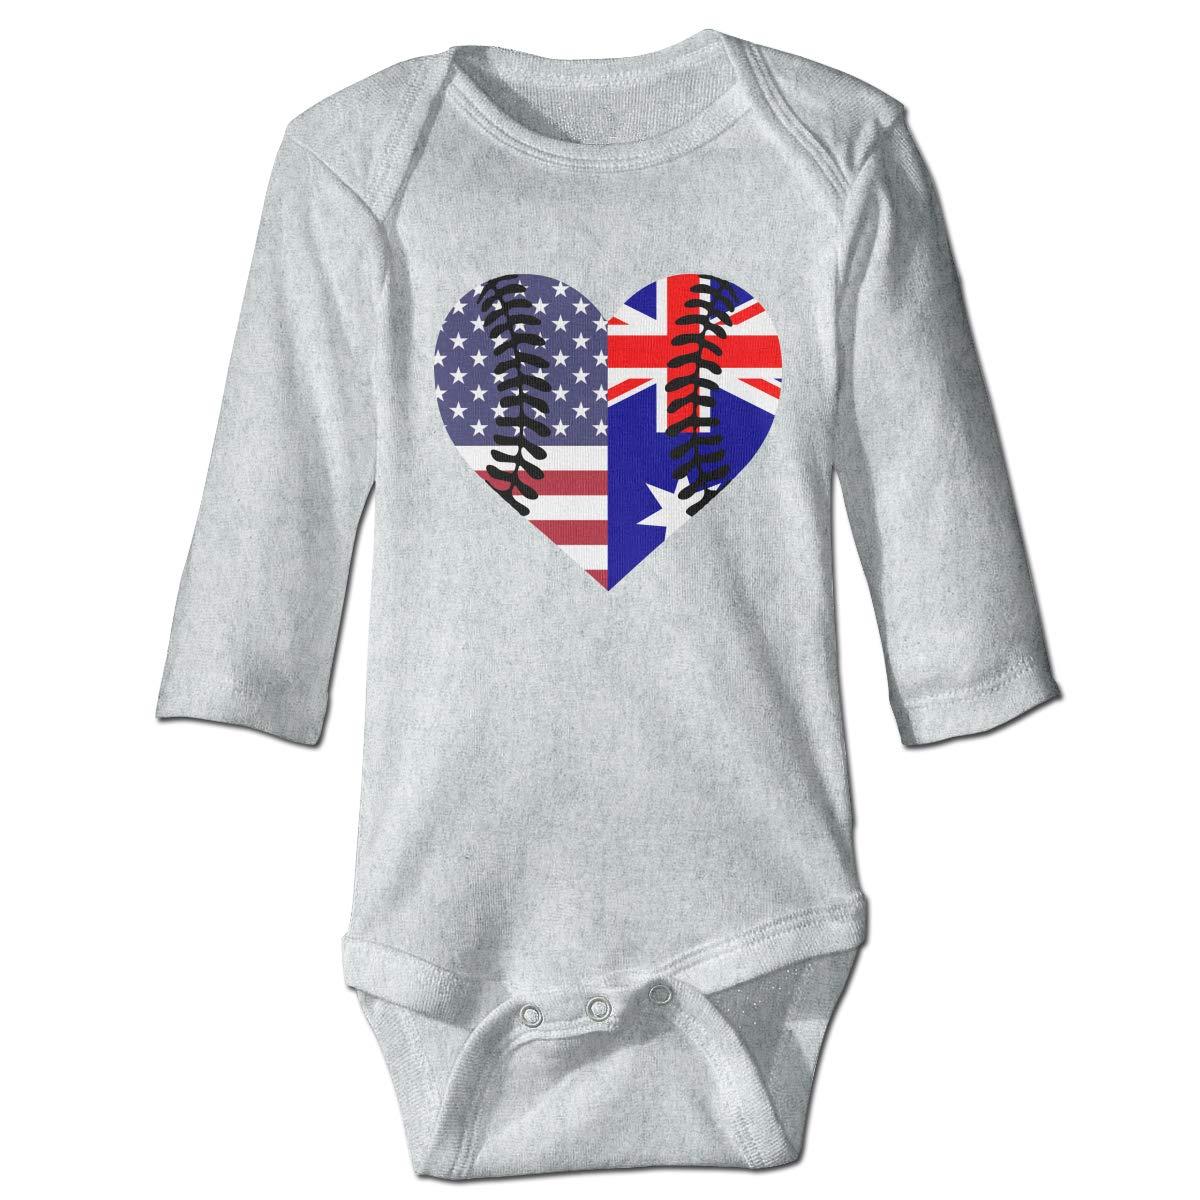 A14UBP Newborn Baby Boys Girls Long Sleeve Romper Bodysuit Australian USA Flag Half Baseball Unisex Playsuit